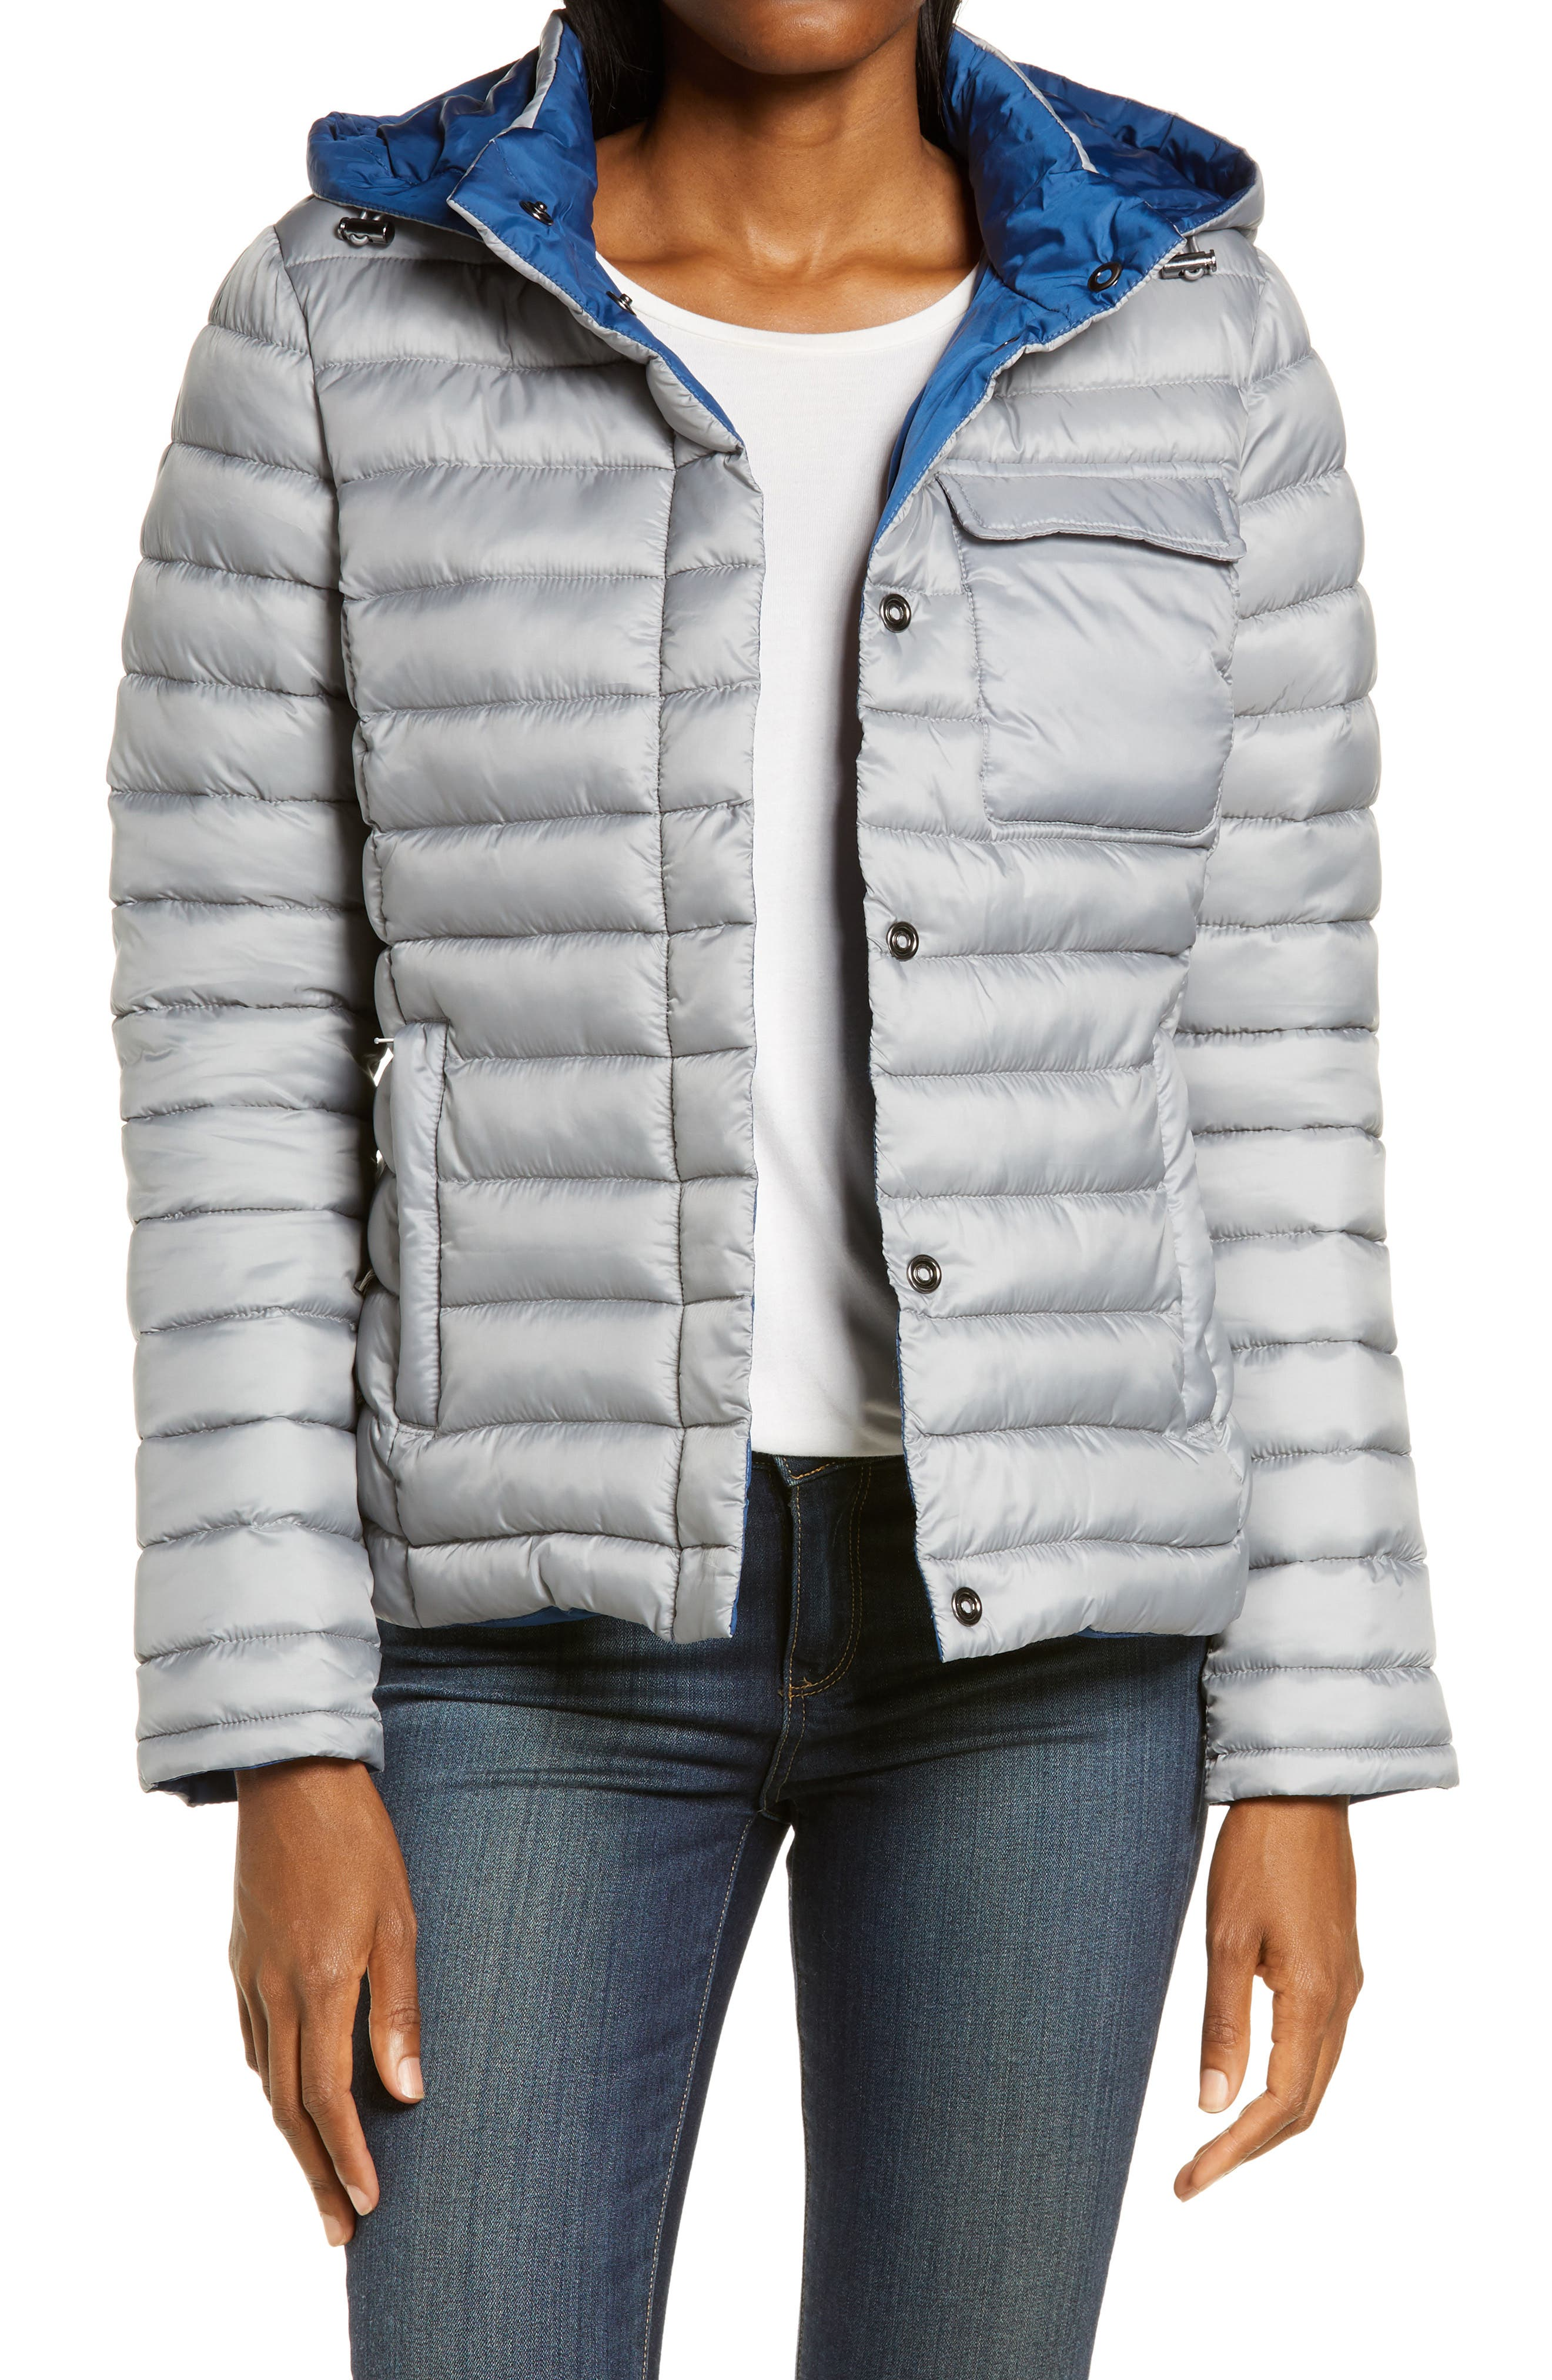 Cardigo Oversized Jacket for Women Winter Plus Size Solid Color Down Coat Long Sleeve Zipper Pocket Overcoat Sweatshirt